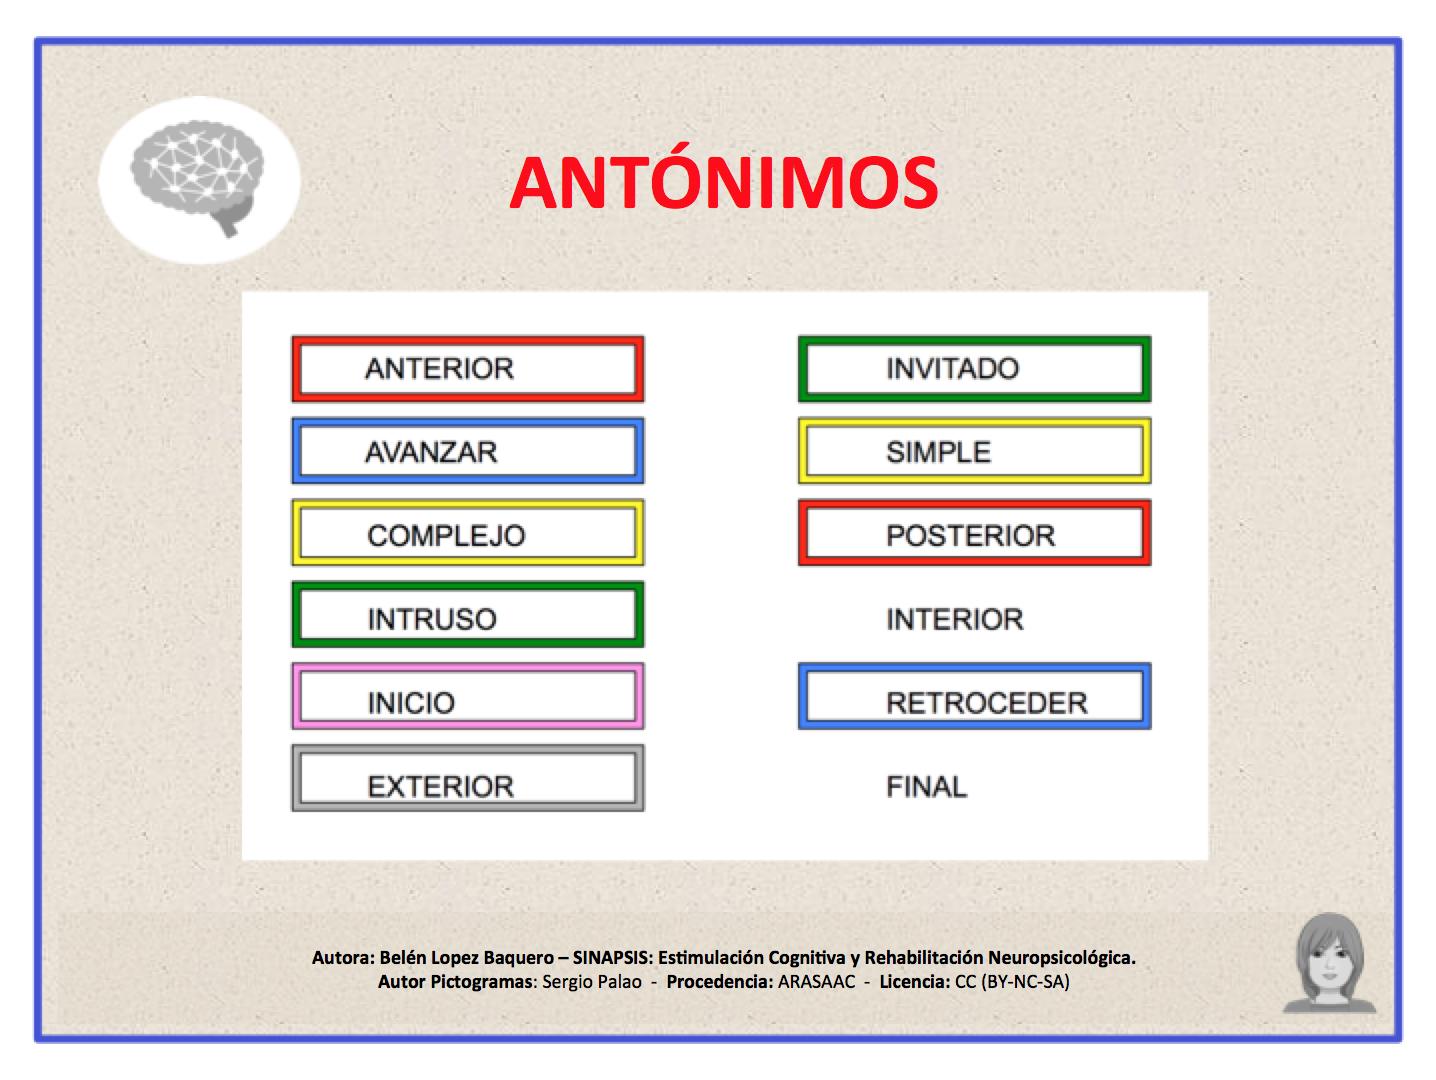 Antonimos